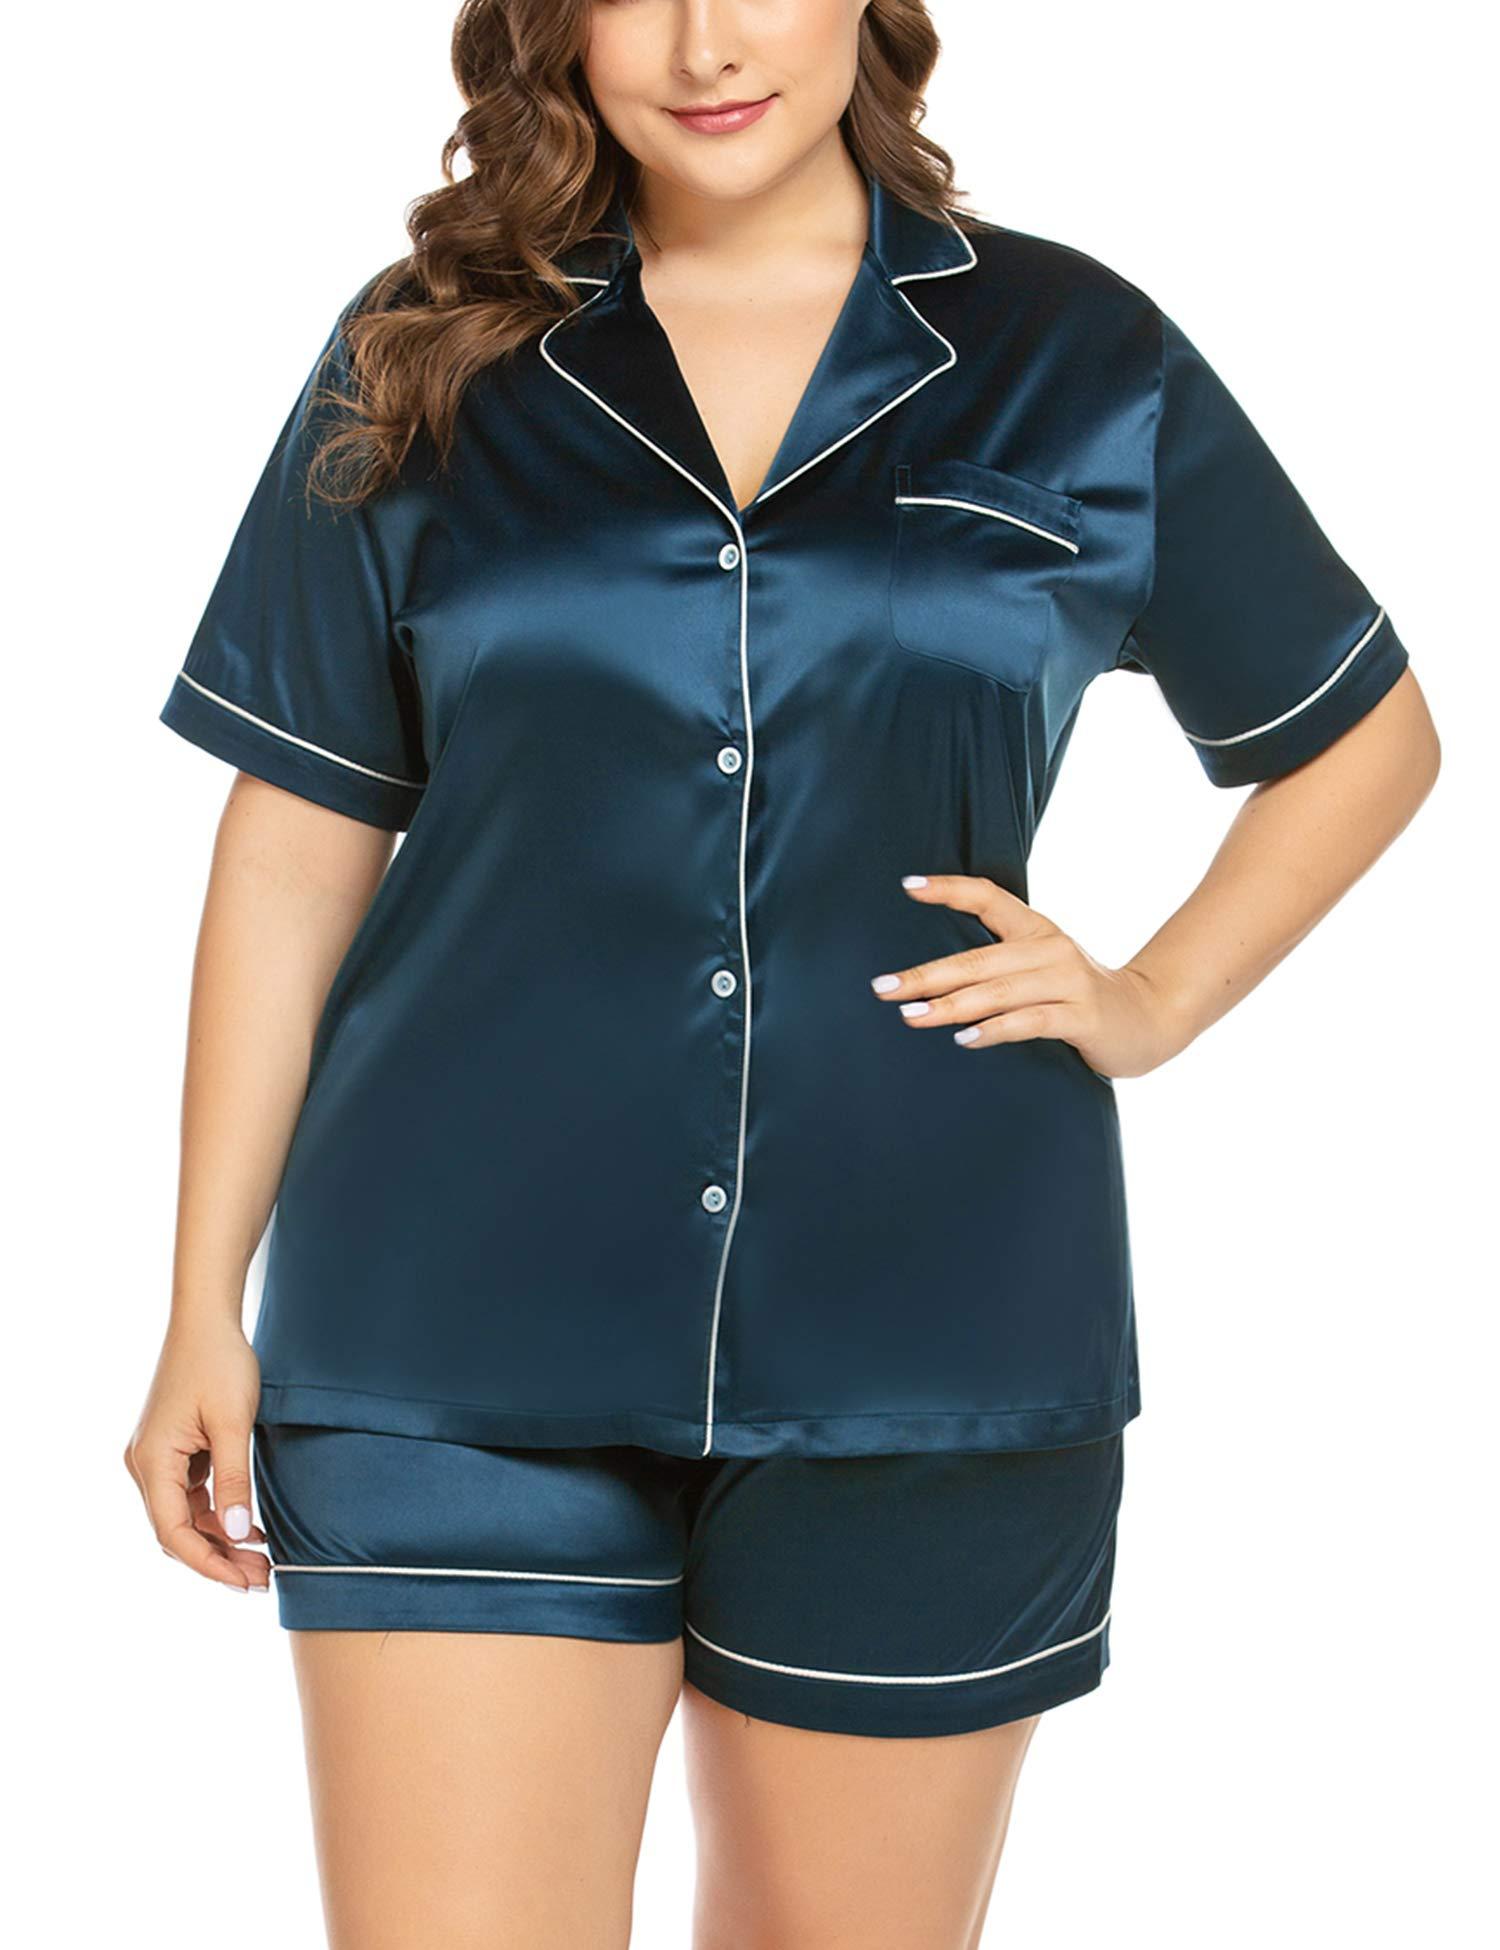 IN'VOLAND Women's Plus Size Pajama Set Short Sleeve Sleepwear Satin Nightwear Loungewear Sets with Pocket